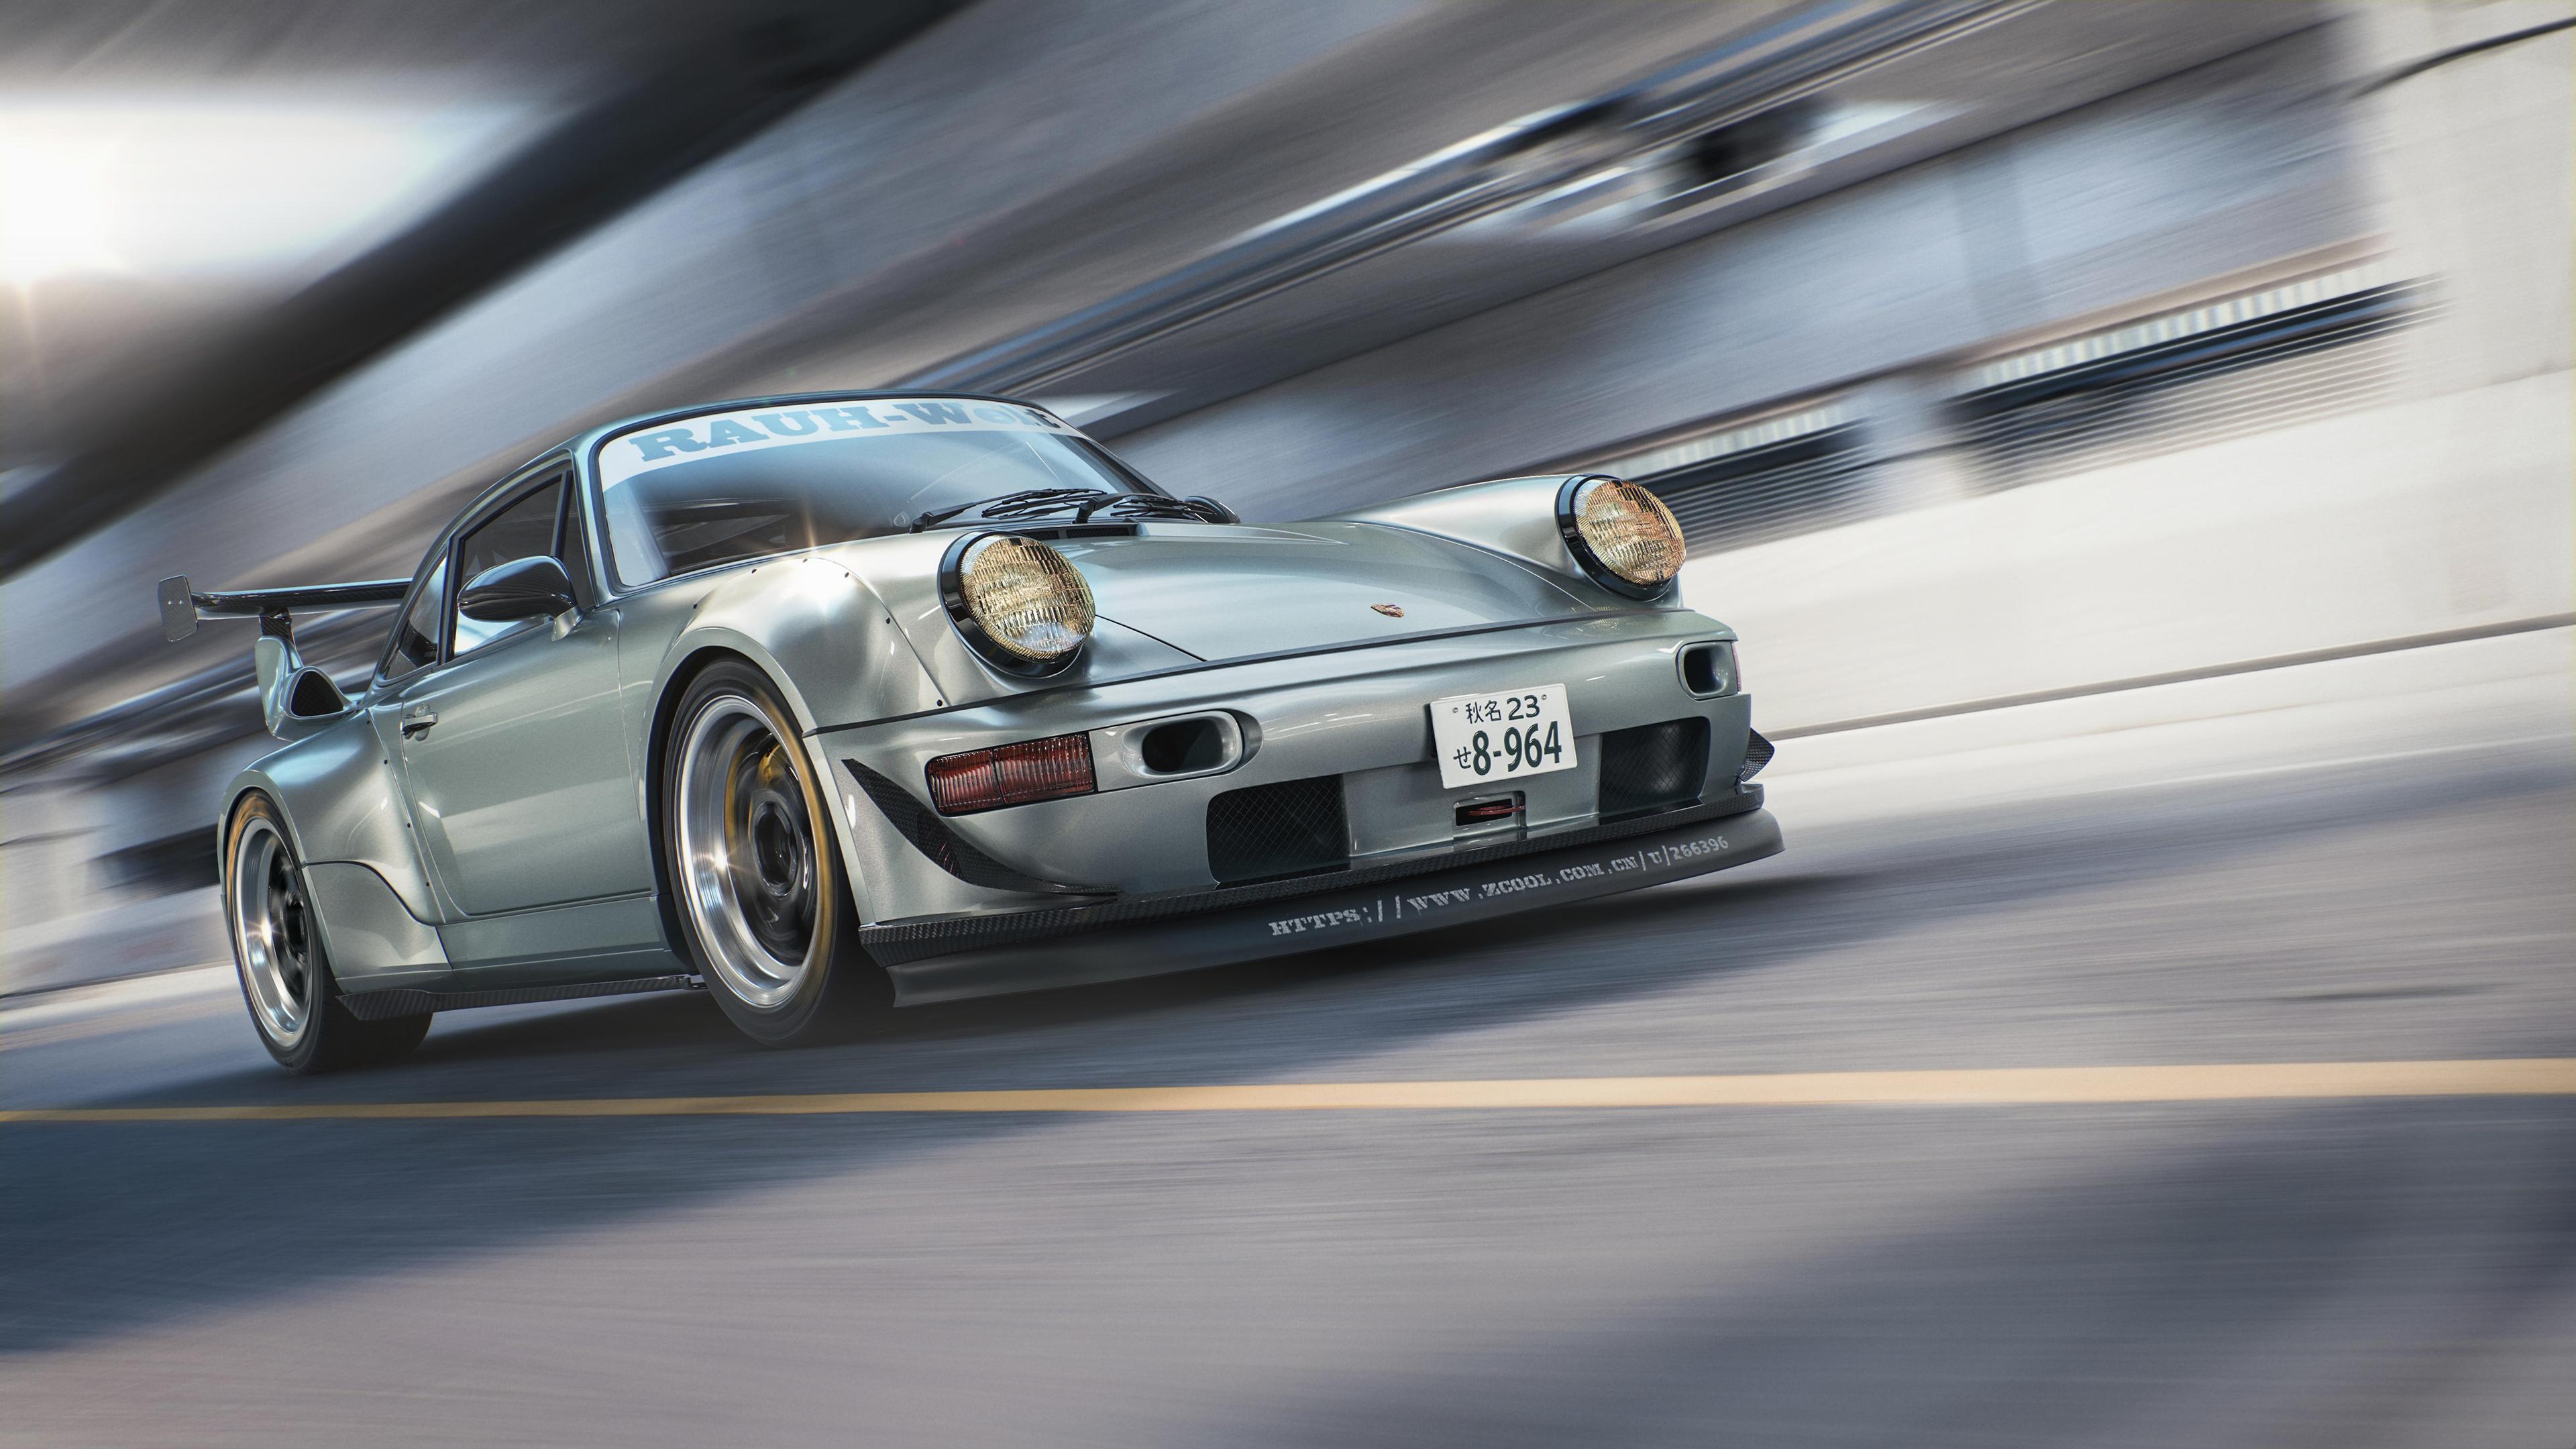 porsche 964 rwb cgi 4k 1547937401 - Porsche 964 RWB CGI 4k - porsche wallpapers, hd-wallpapers, cgi wallpapers, cars wallpapers, behance wallpapers, 4k-wallpapers